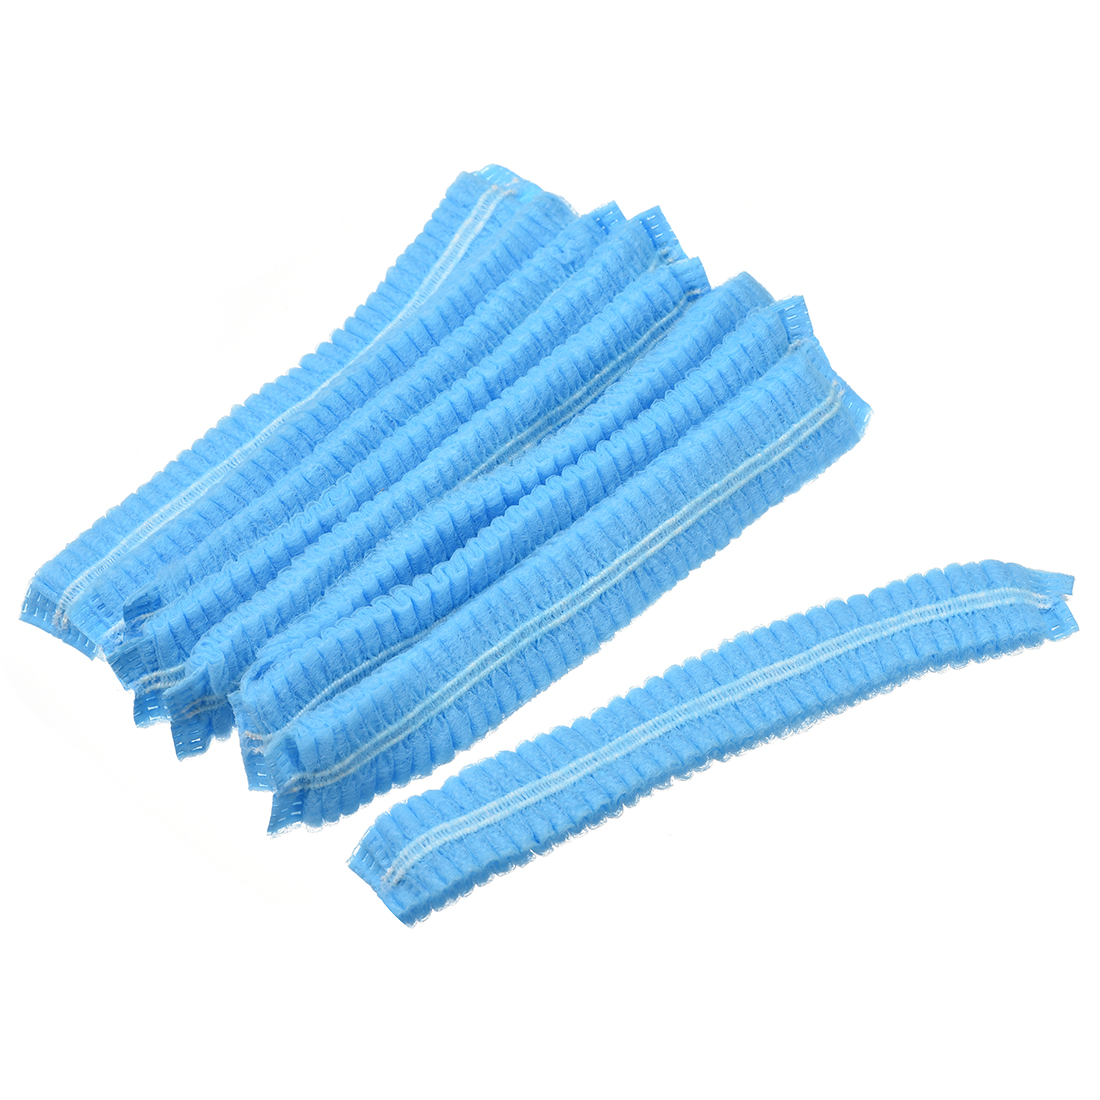 "Bouffant Caps, Size 16.9"", Hair Net, Propene Polymer, Blue, 100Pcs"